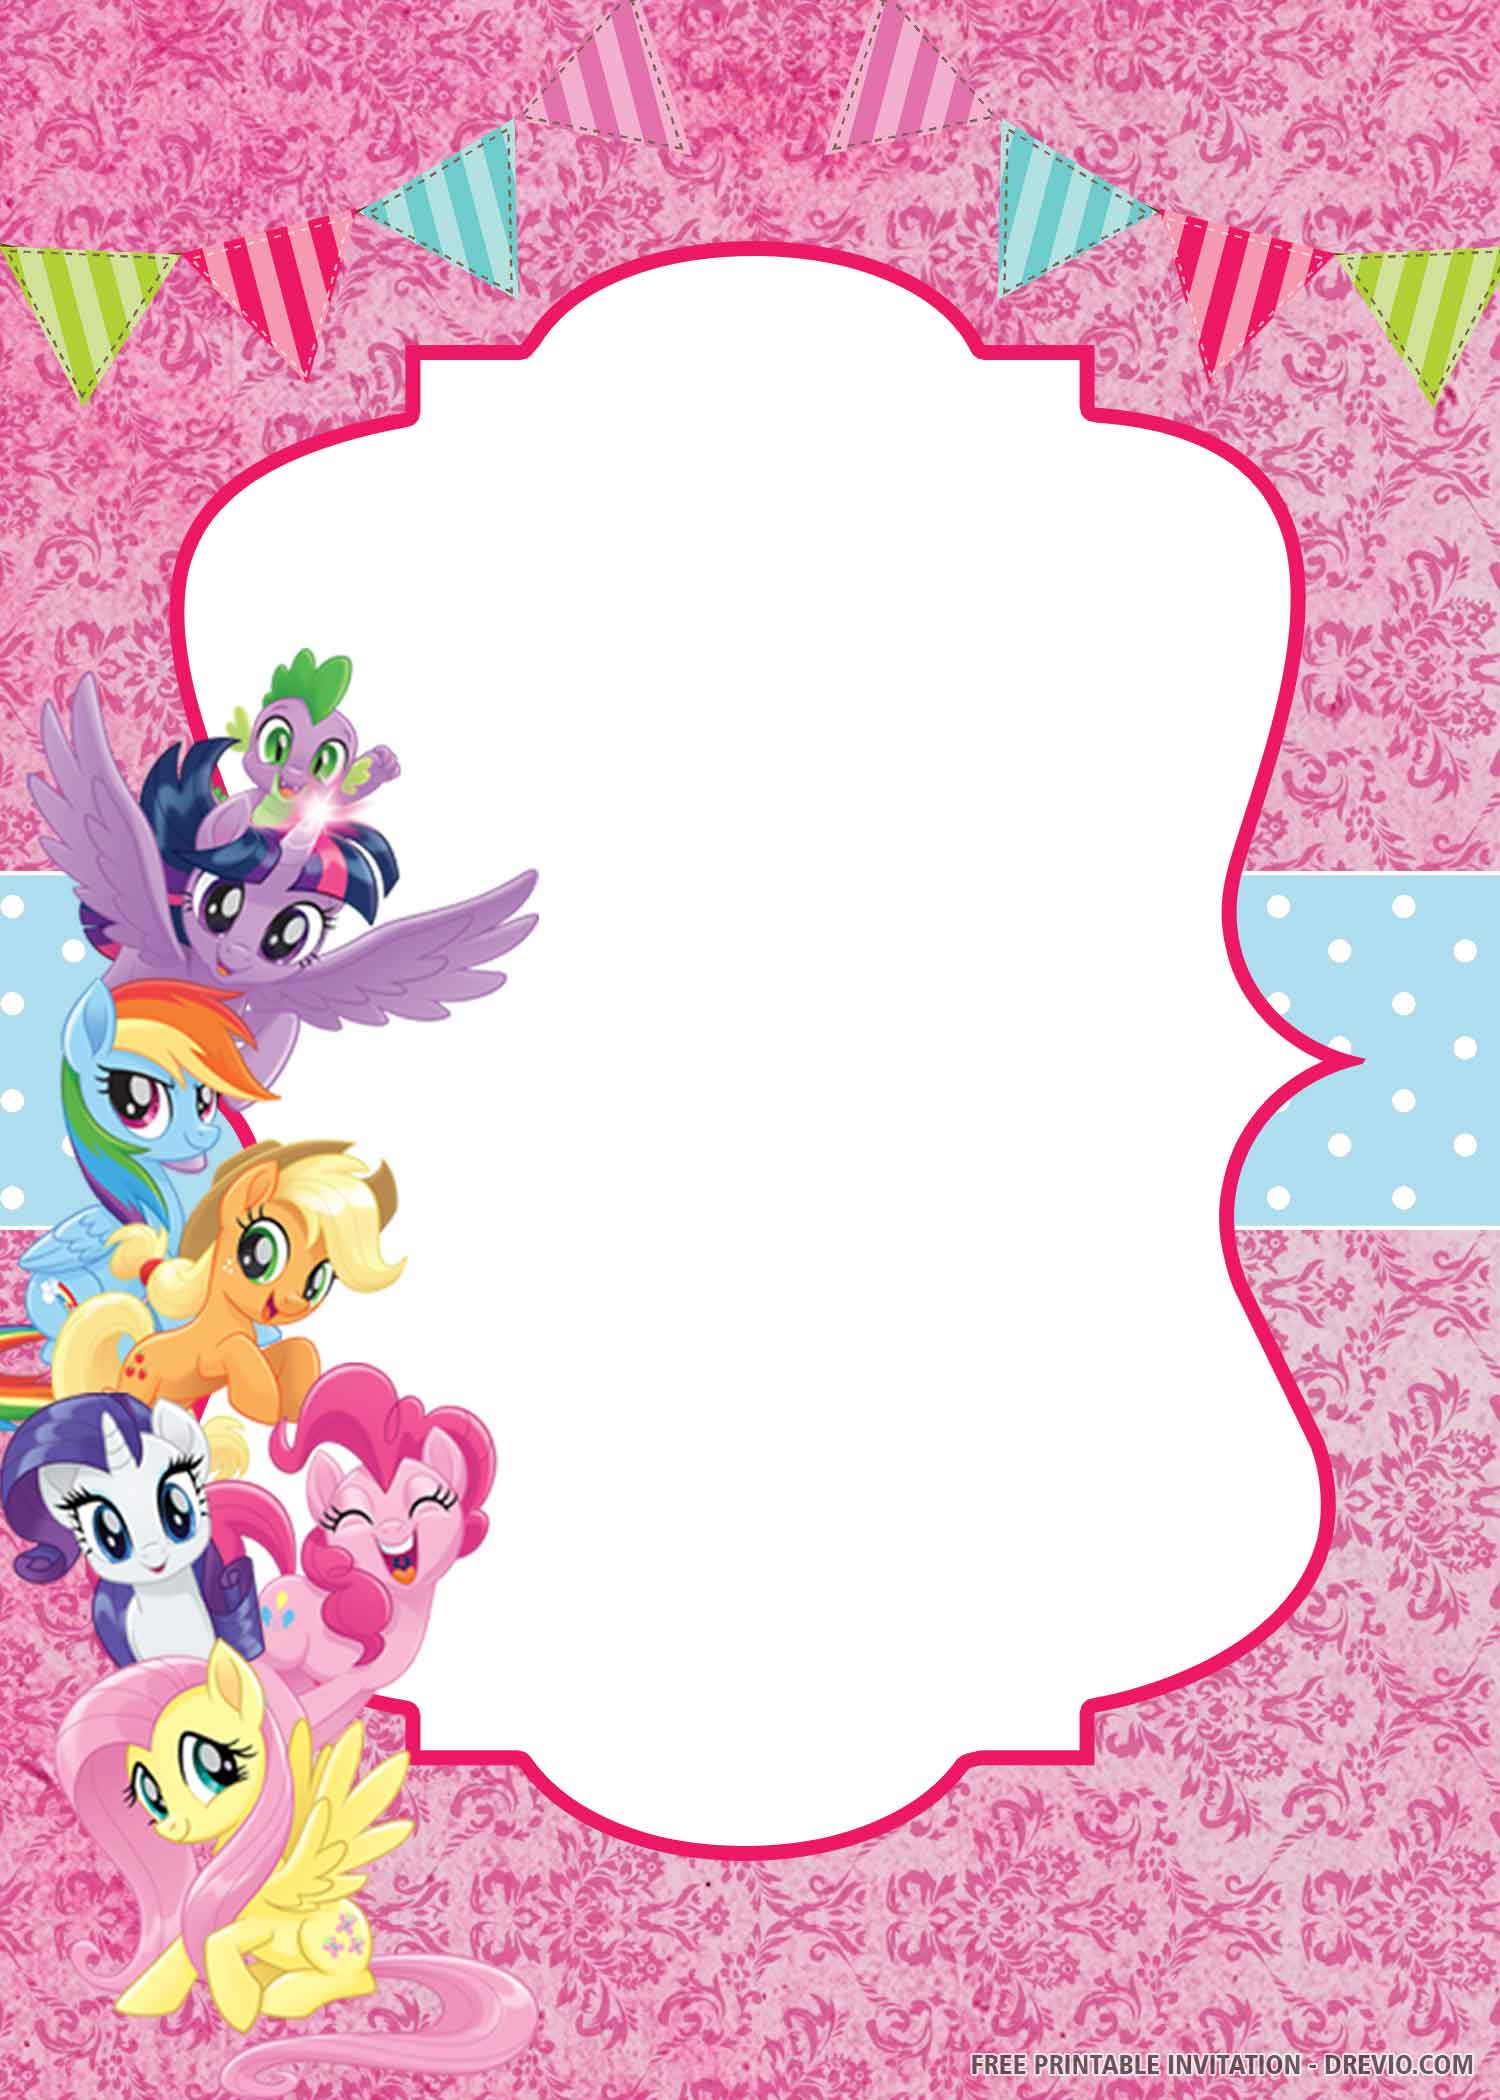 Free Printable My Little Pony Invitation Templates